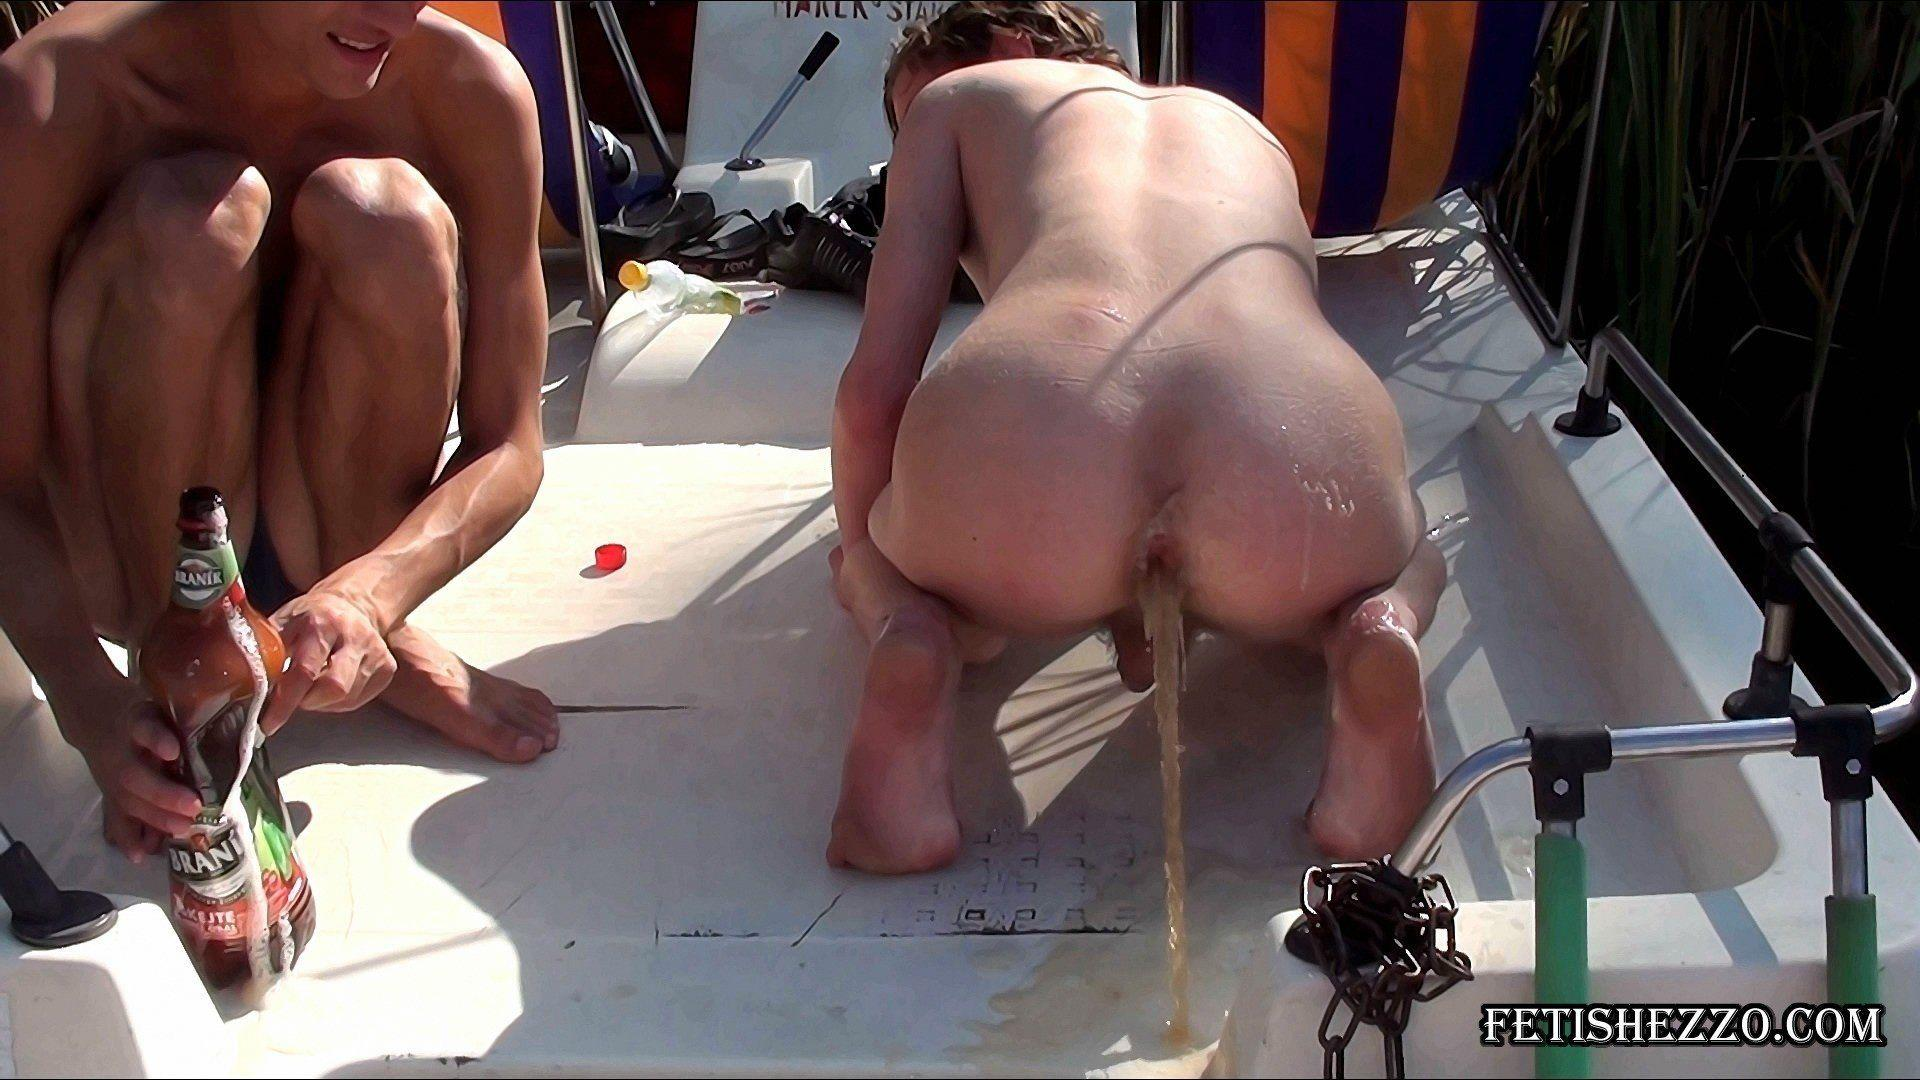 Plump women sex pictures